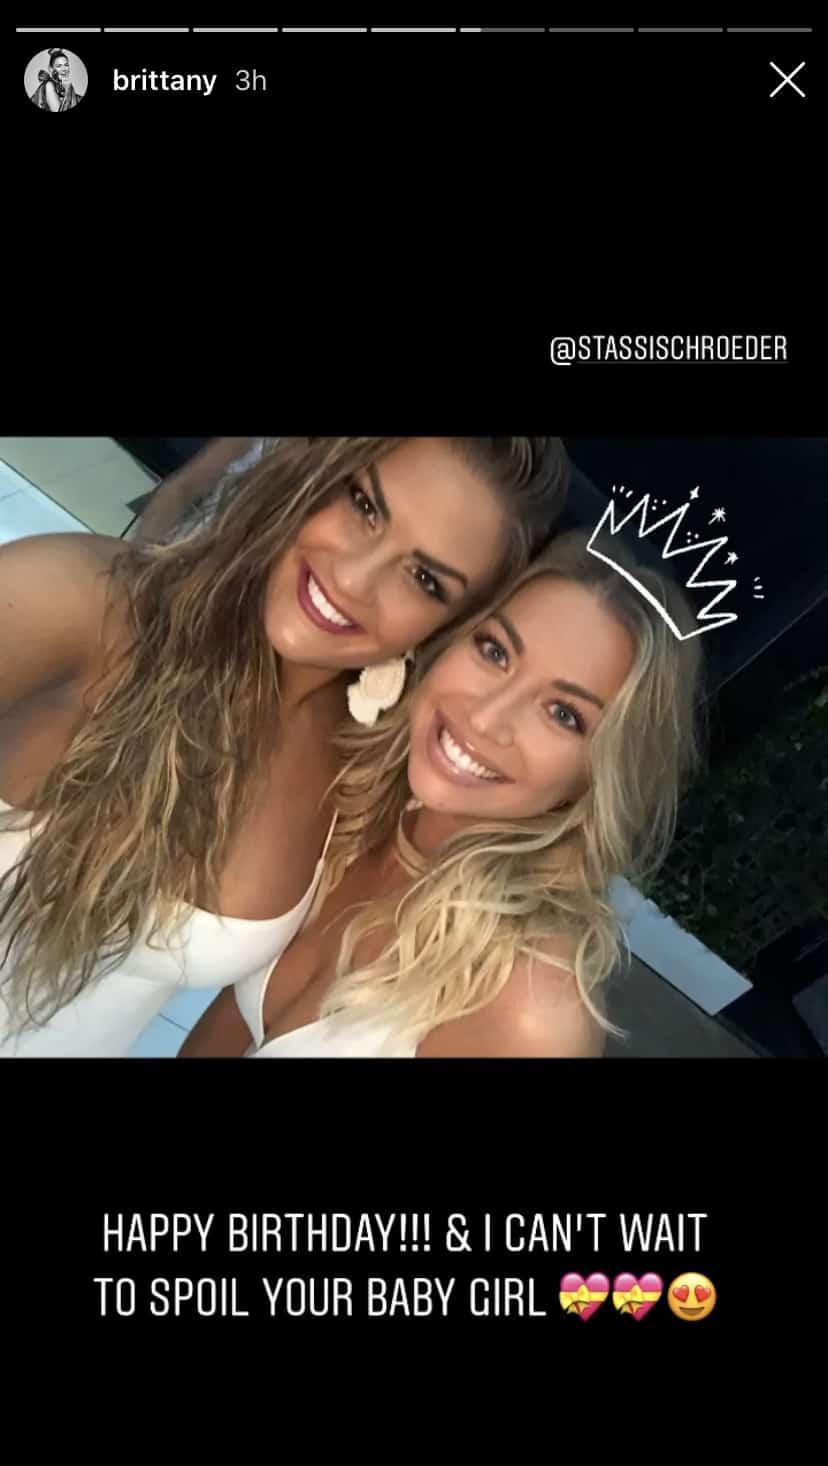 Vanderpump Rules Brittany Cartwright Wishes Stassi Schroeder a Happy Birthday